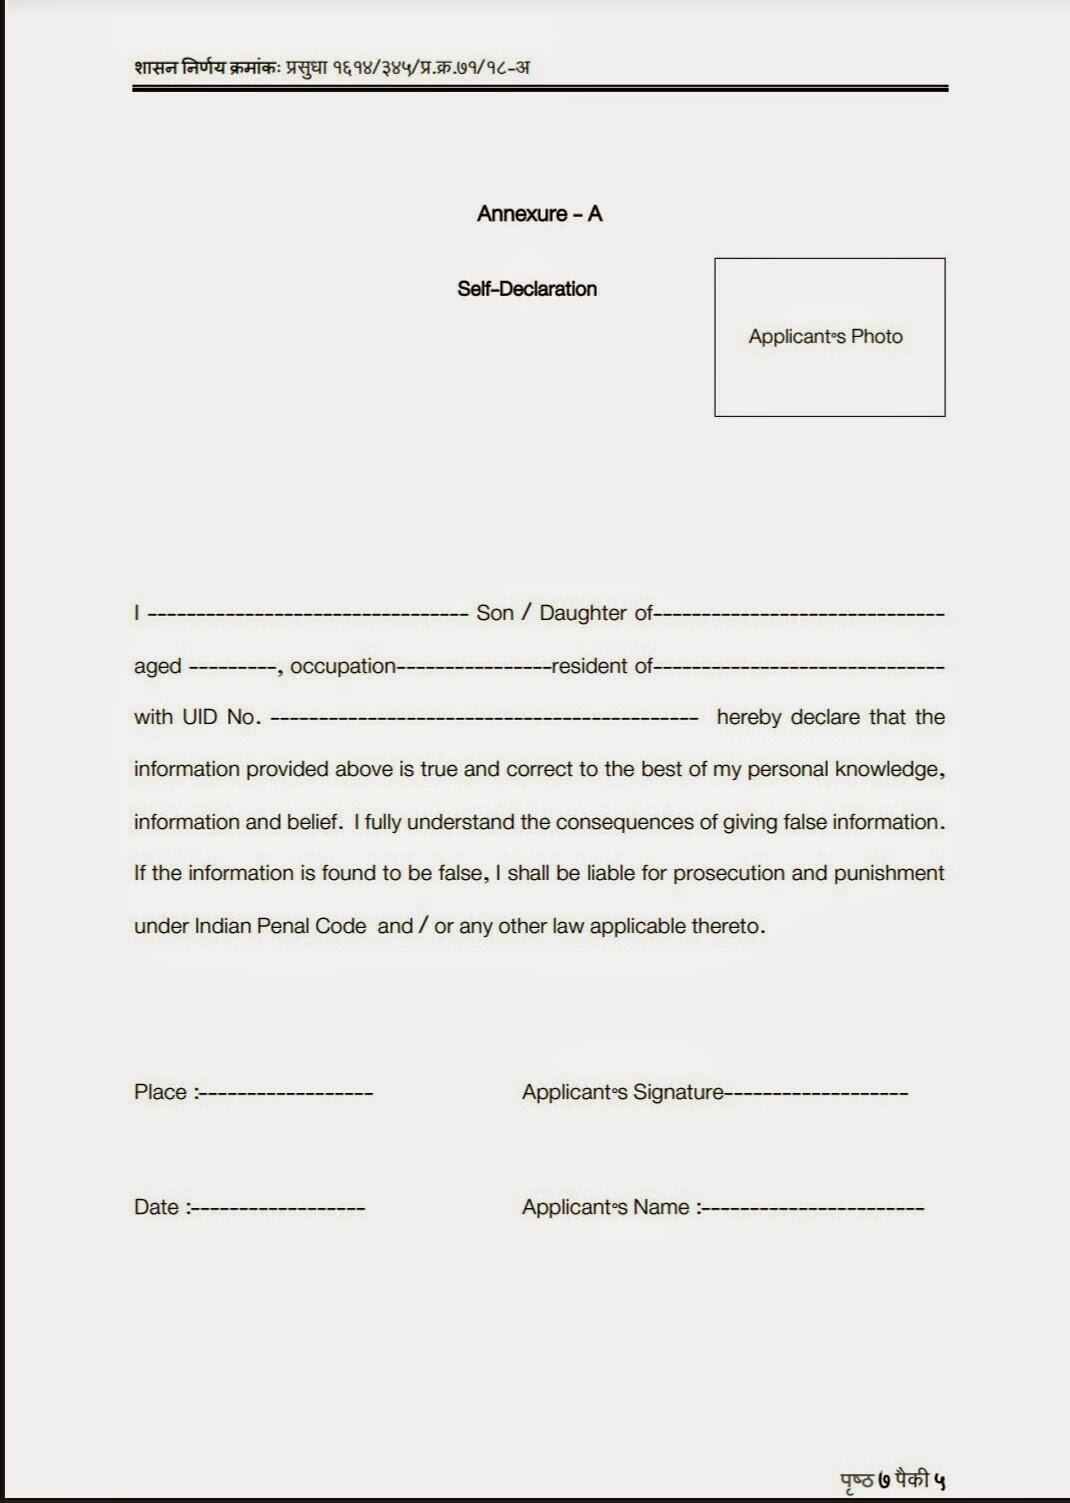 Self affidavit format mersnoforum self affidavit format altavistaventures Image collections